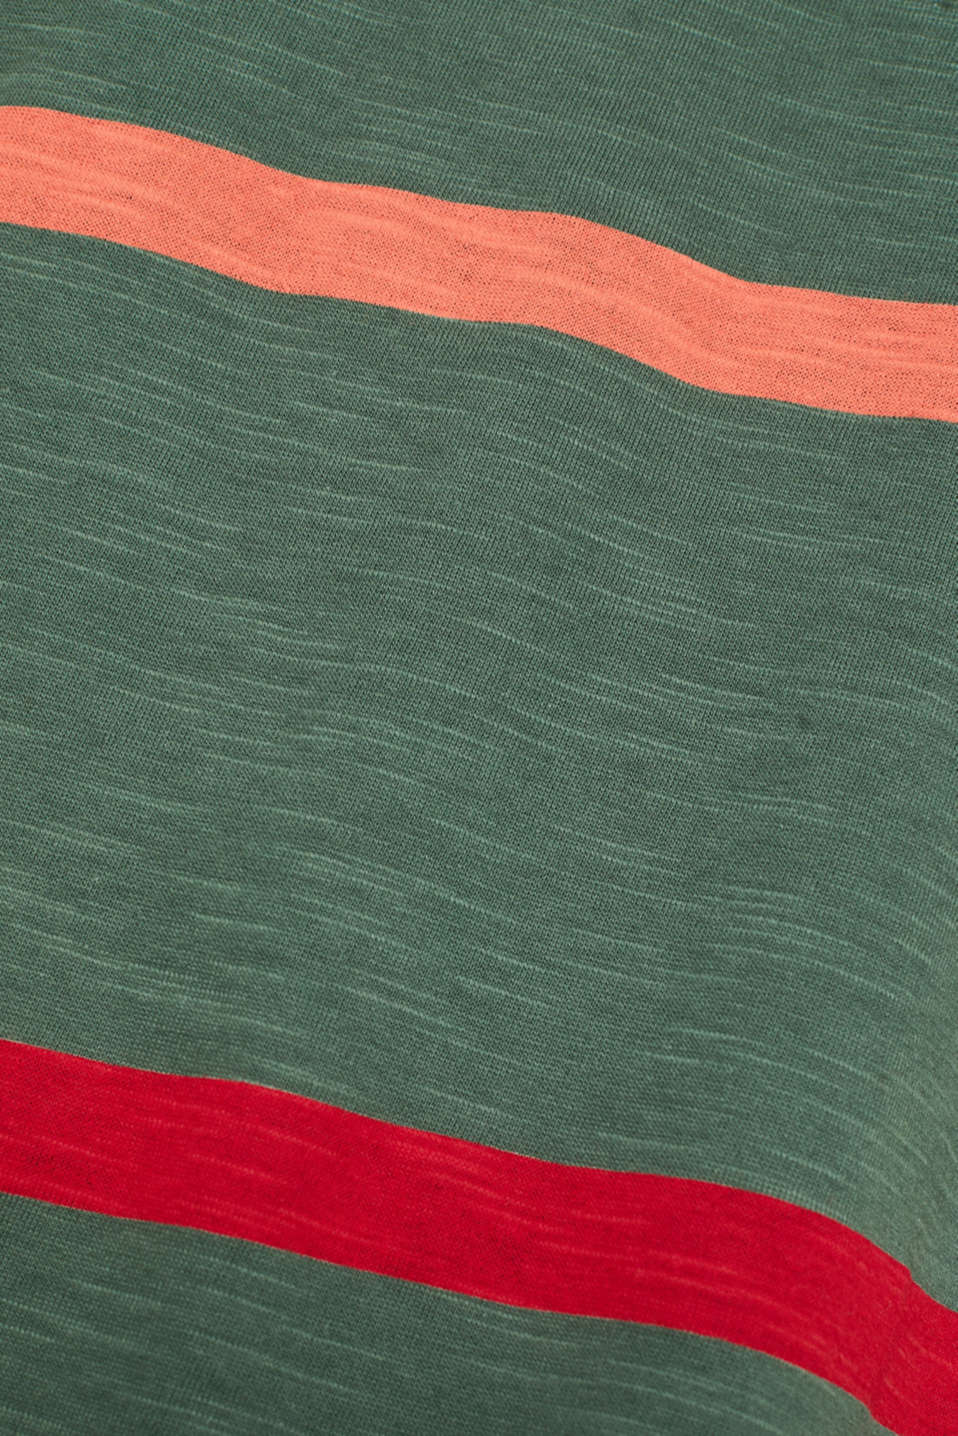 Striped T-shirt, 100% cotton, KHAKI GREEN, detail image number 4